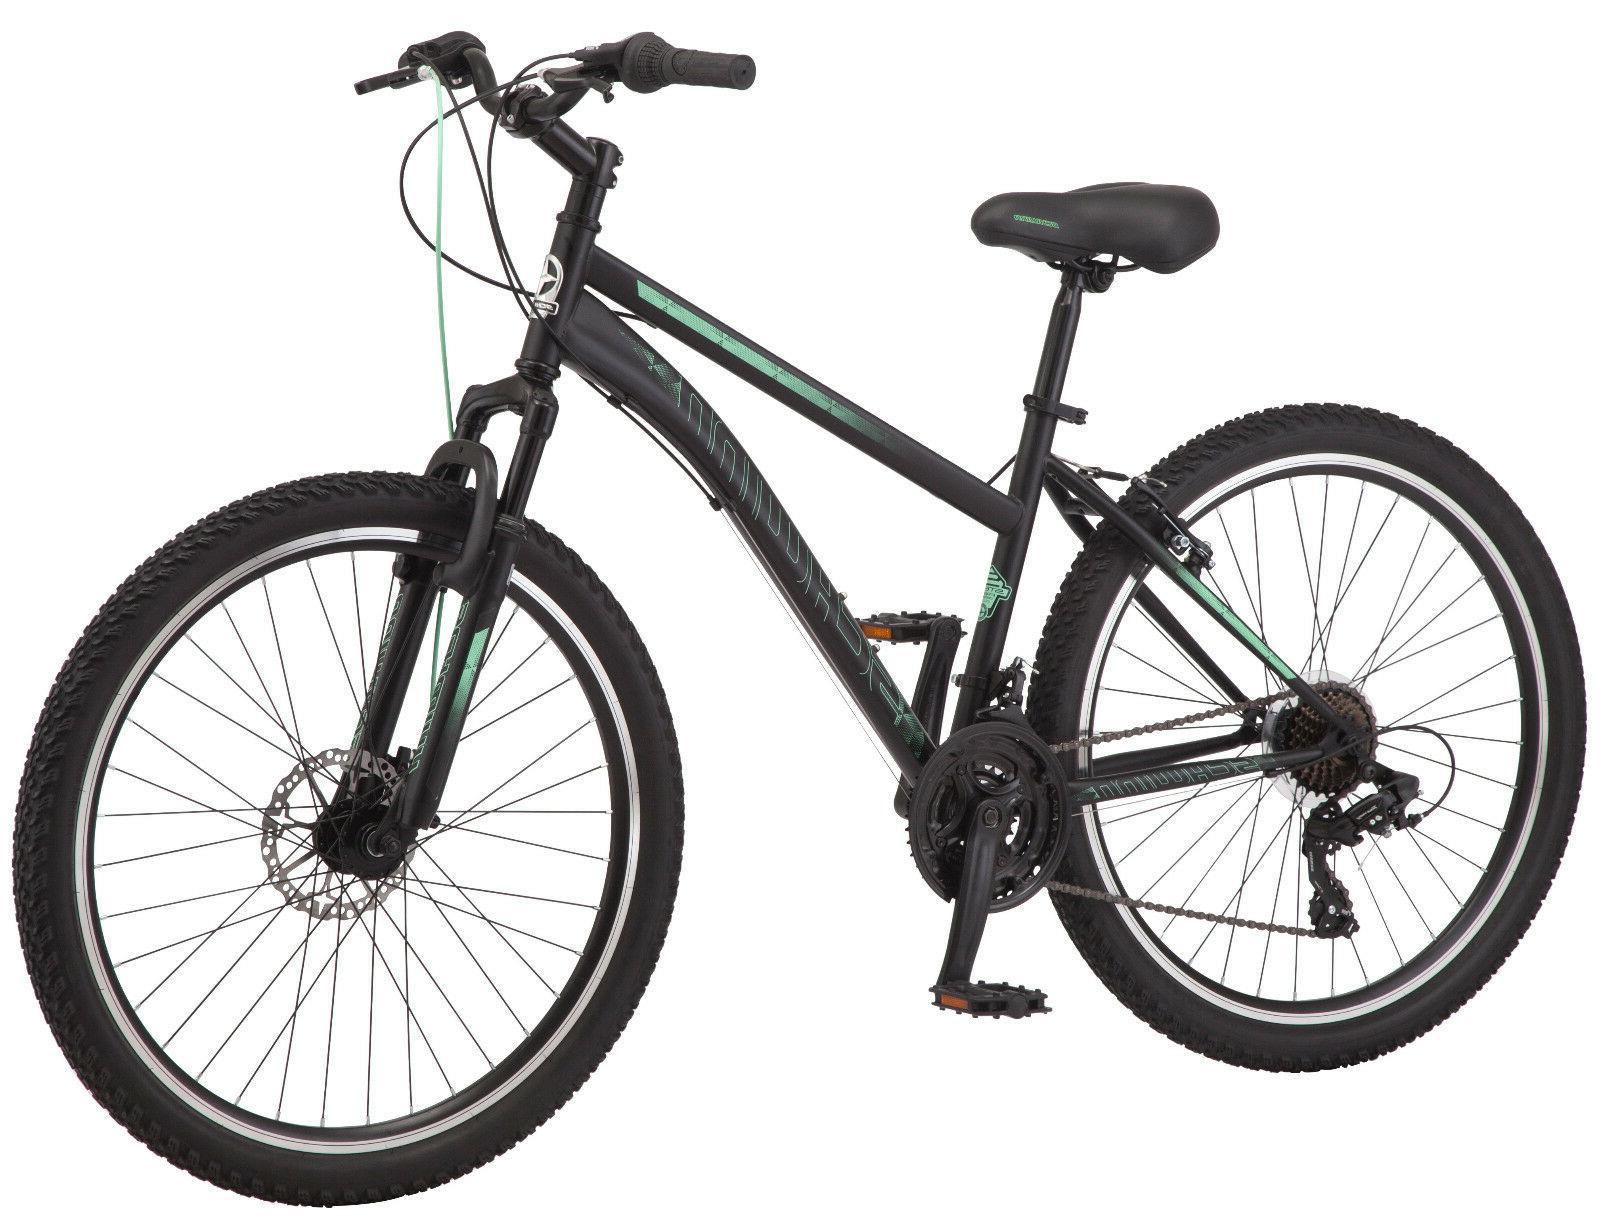 "NEW 26"" Women's Mountain Bike Speed Frame"